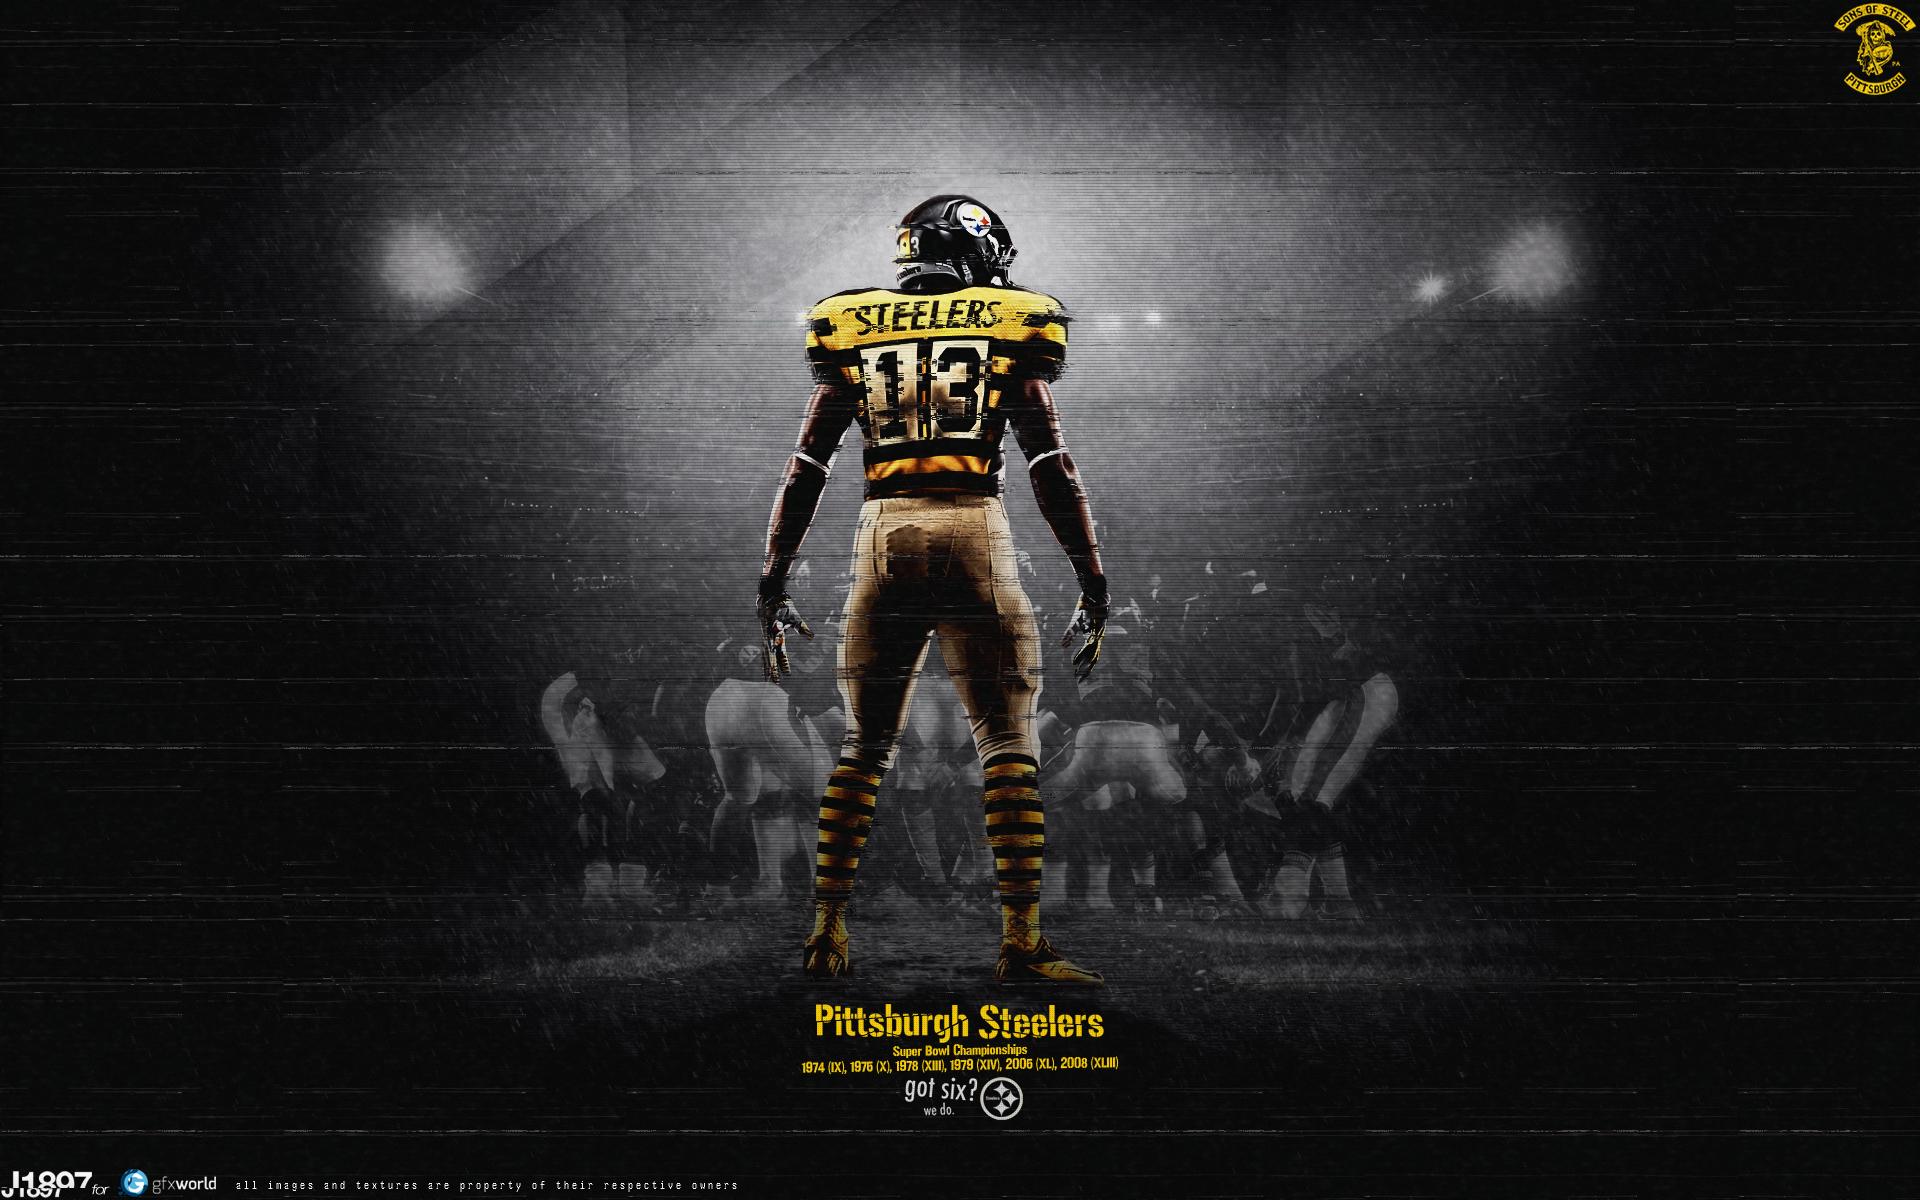 162. Pittsburgh Steelers by J1897